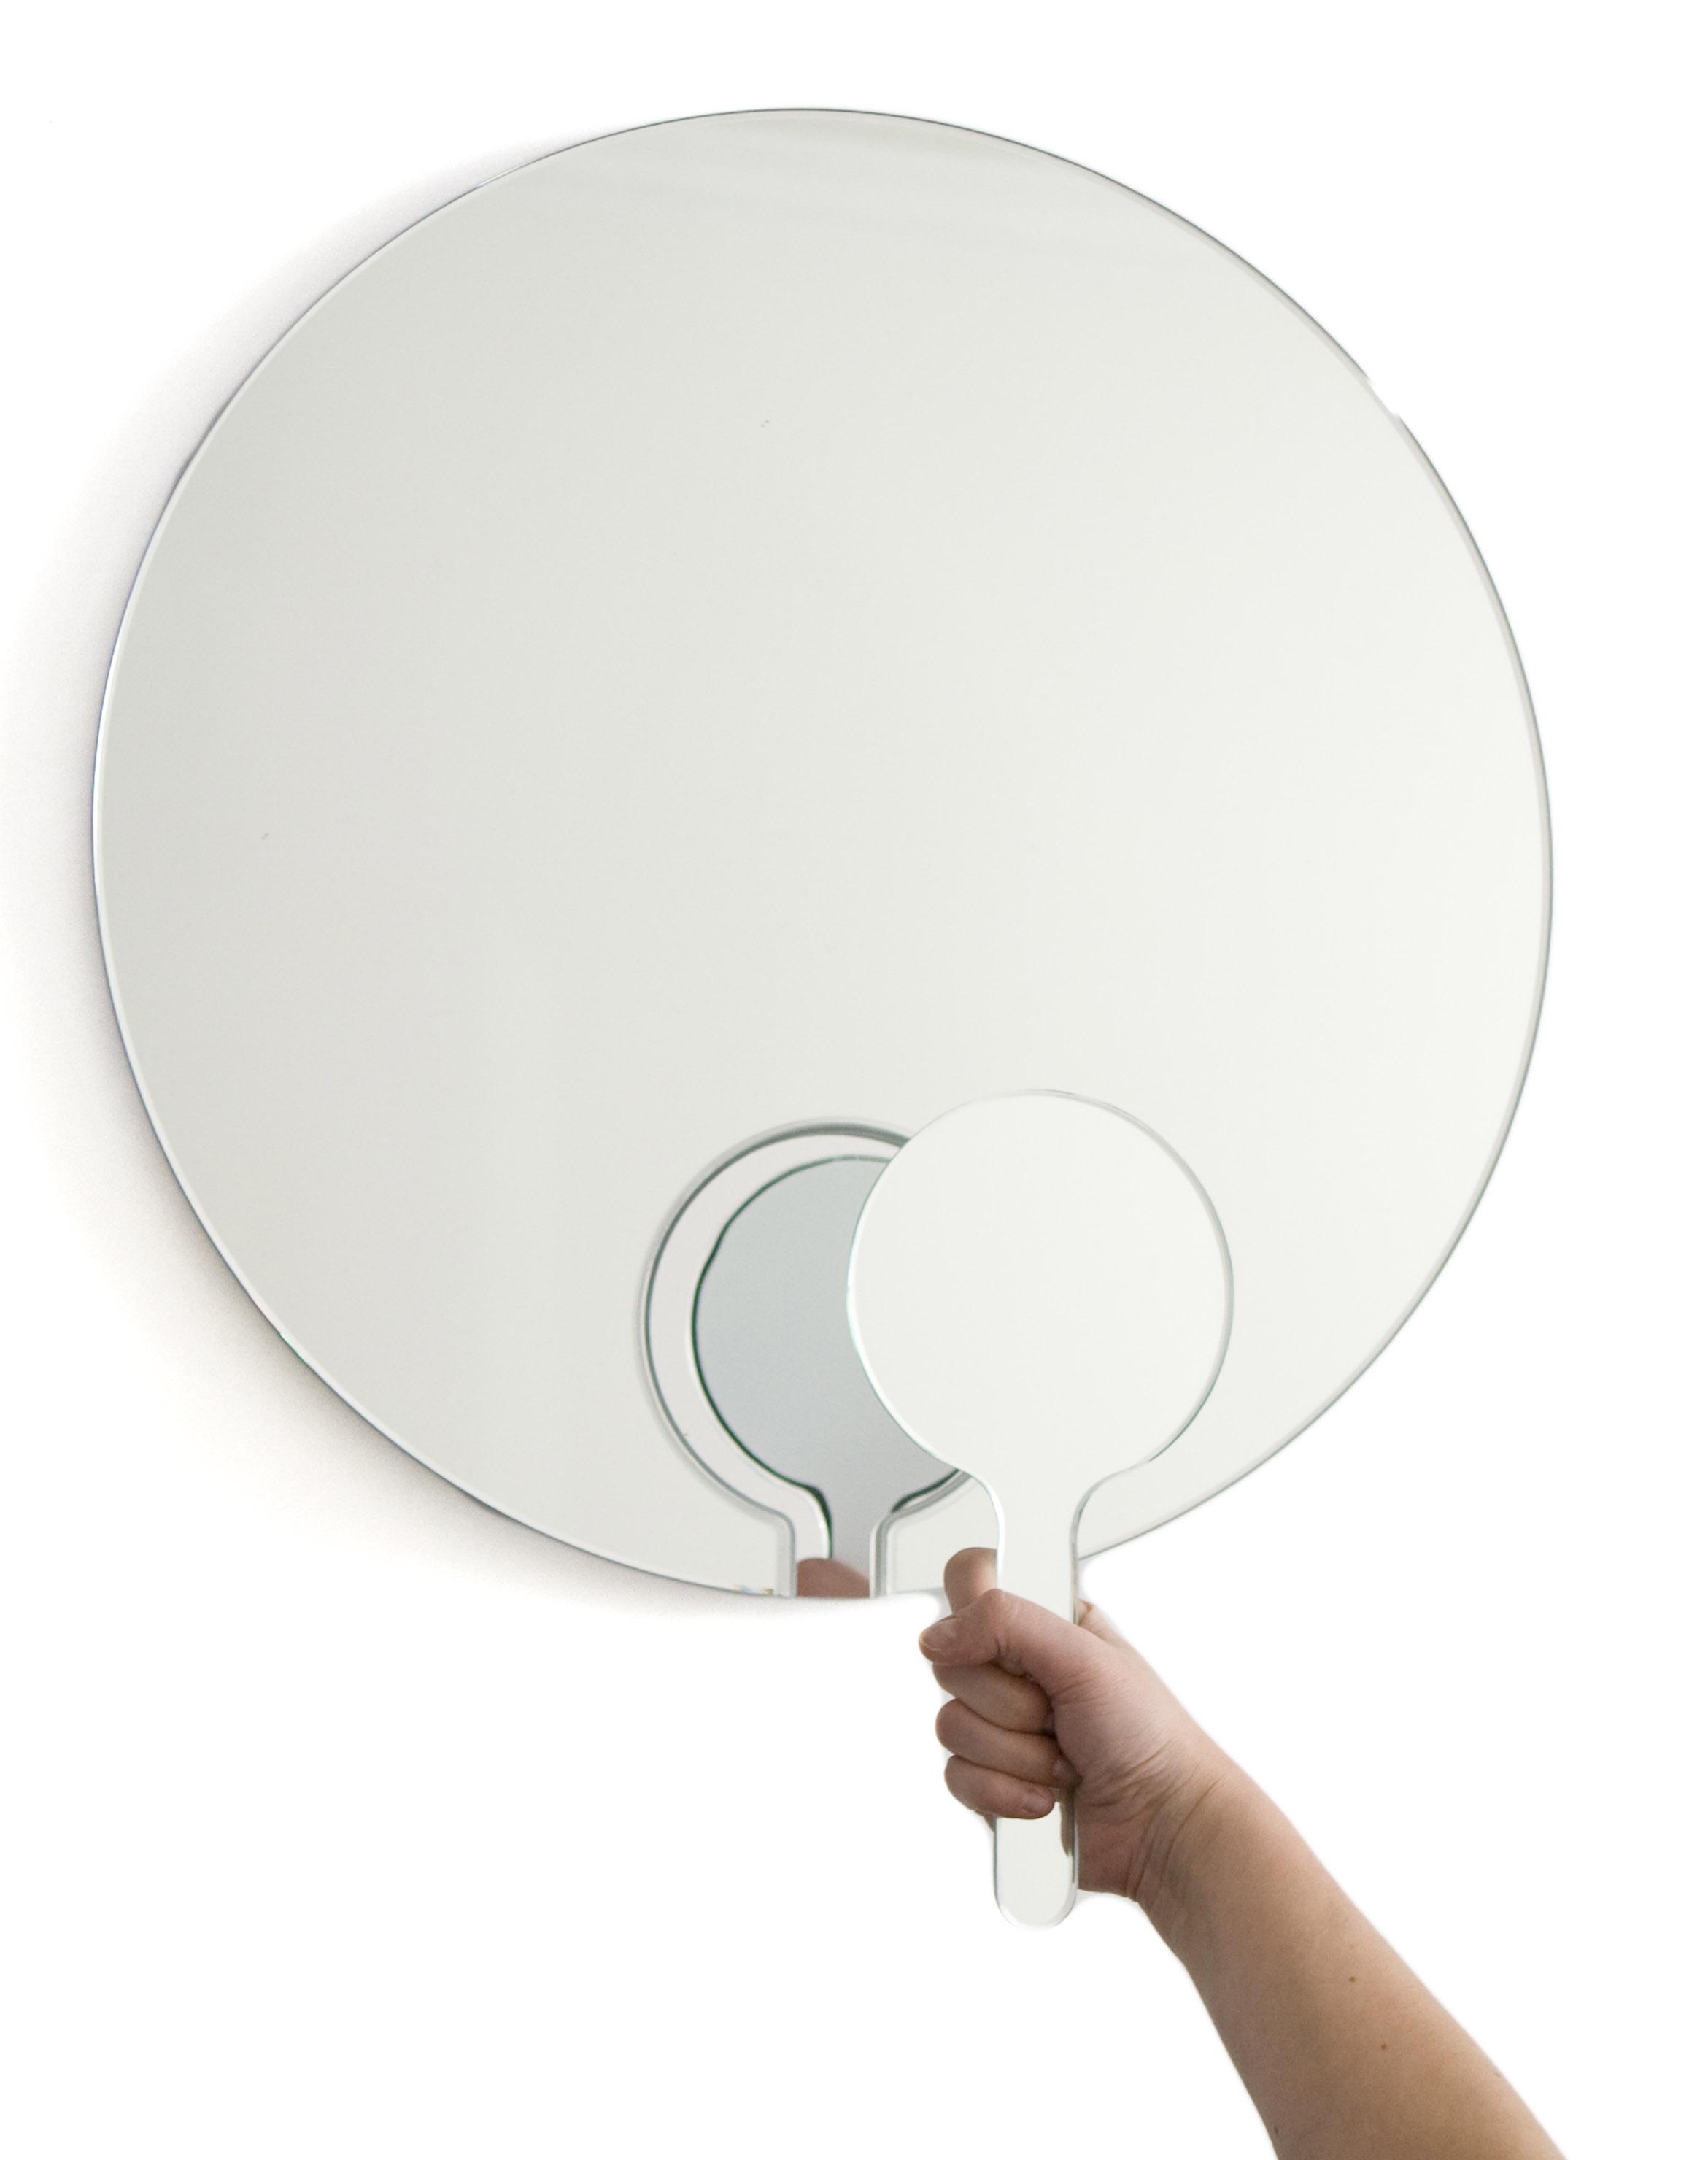 Mirror mirror spegel i spegel